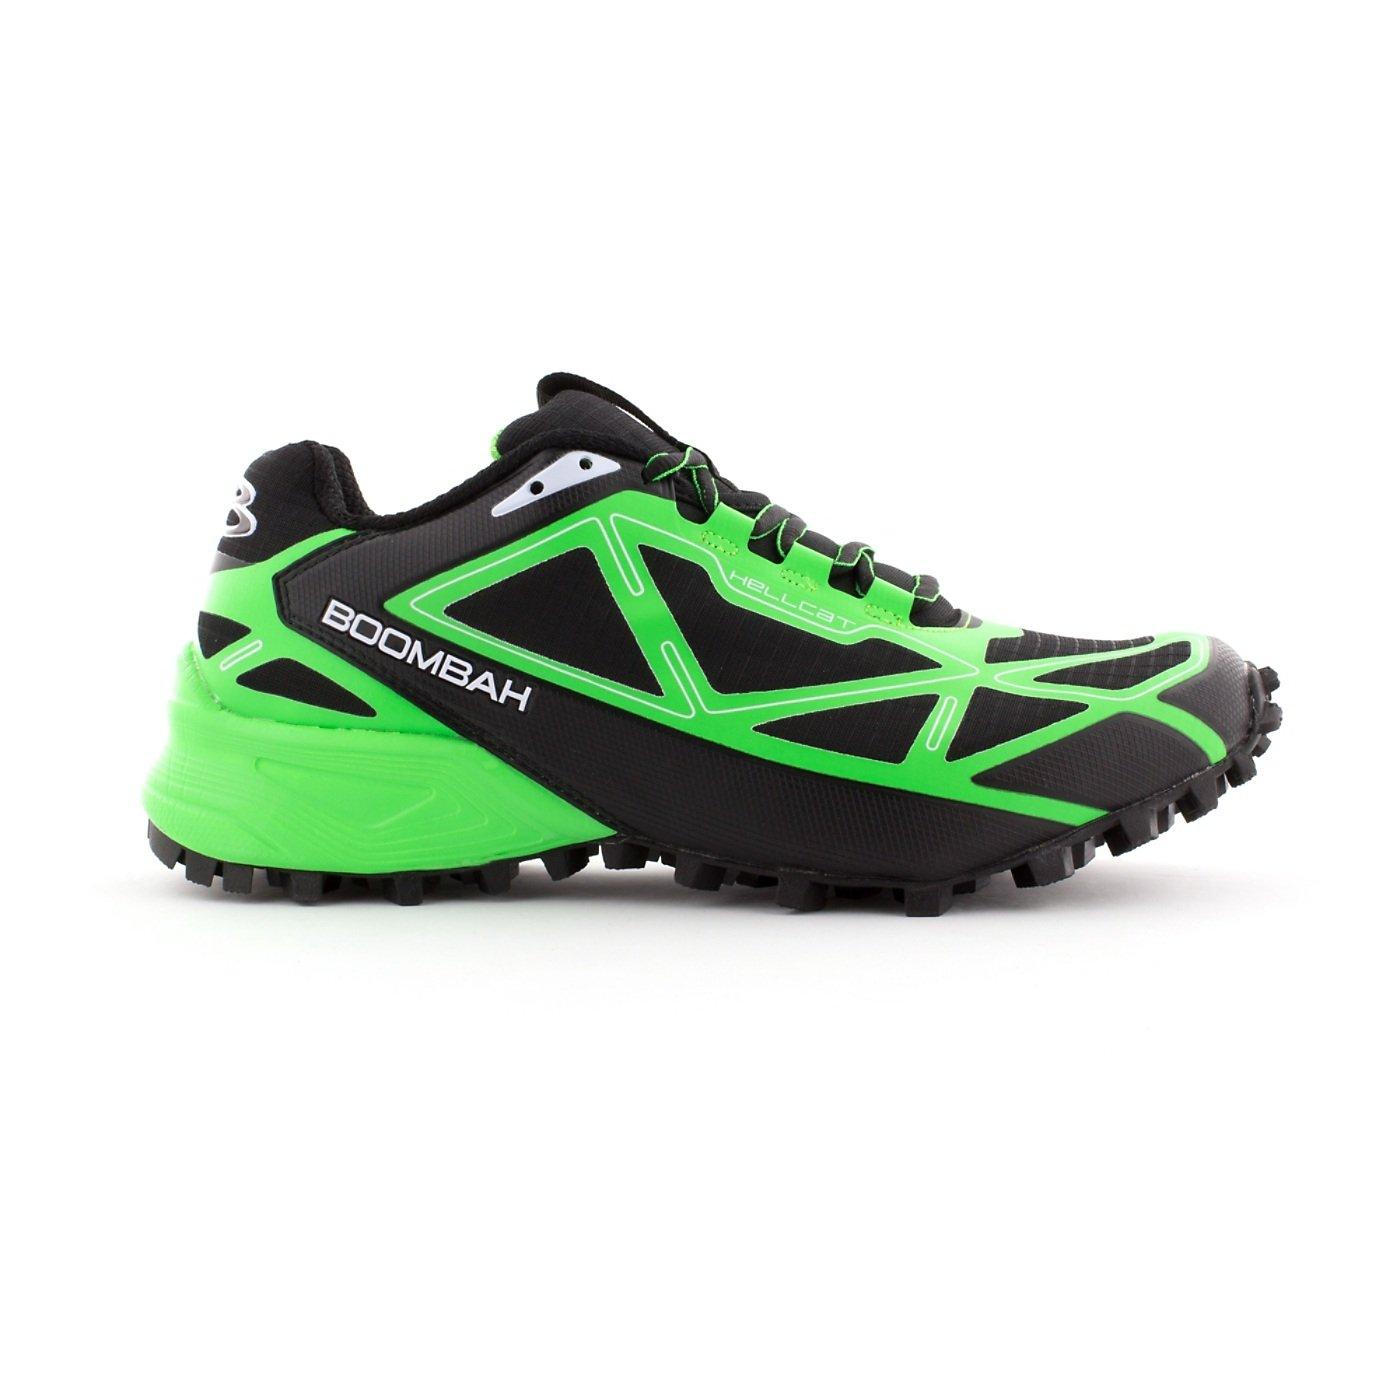 Boombah Men's Hellcat Trail Shoe - 14 Color Options - Multiple Sizes B073X71DBP 14|Black/Lime Green